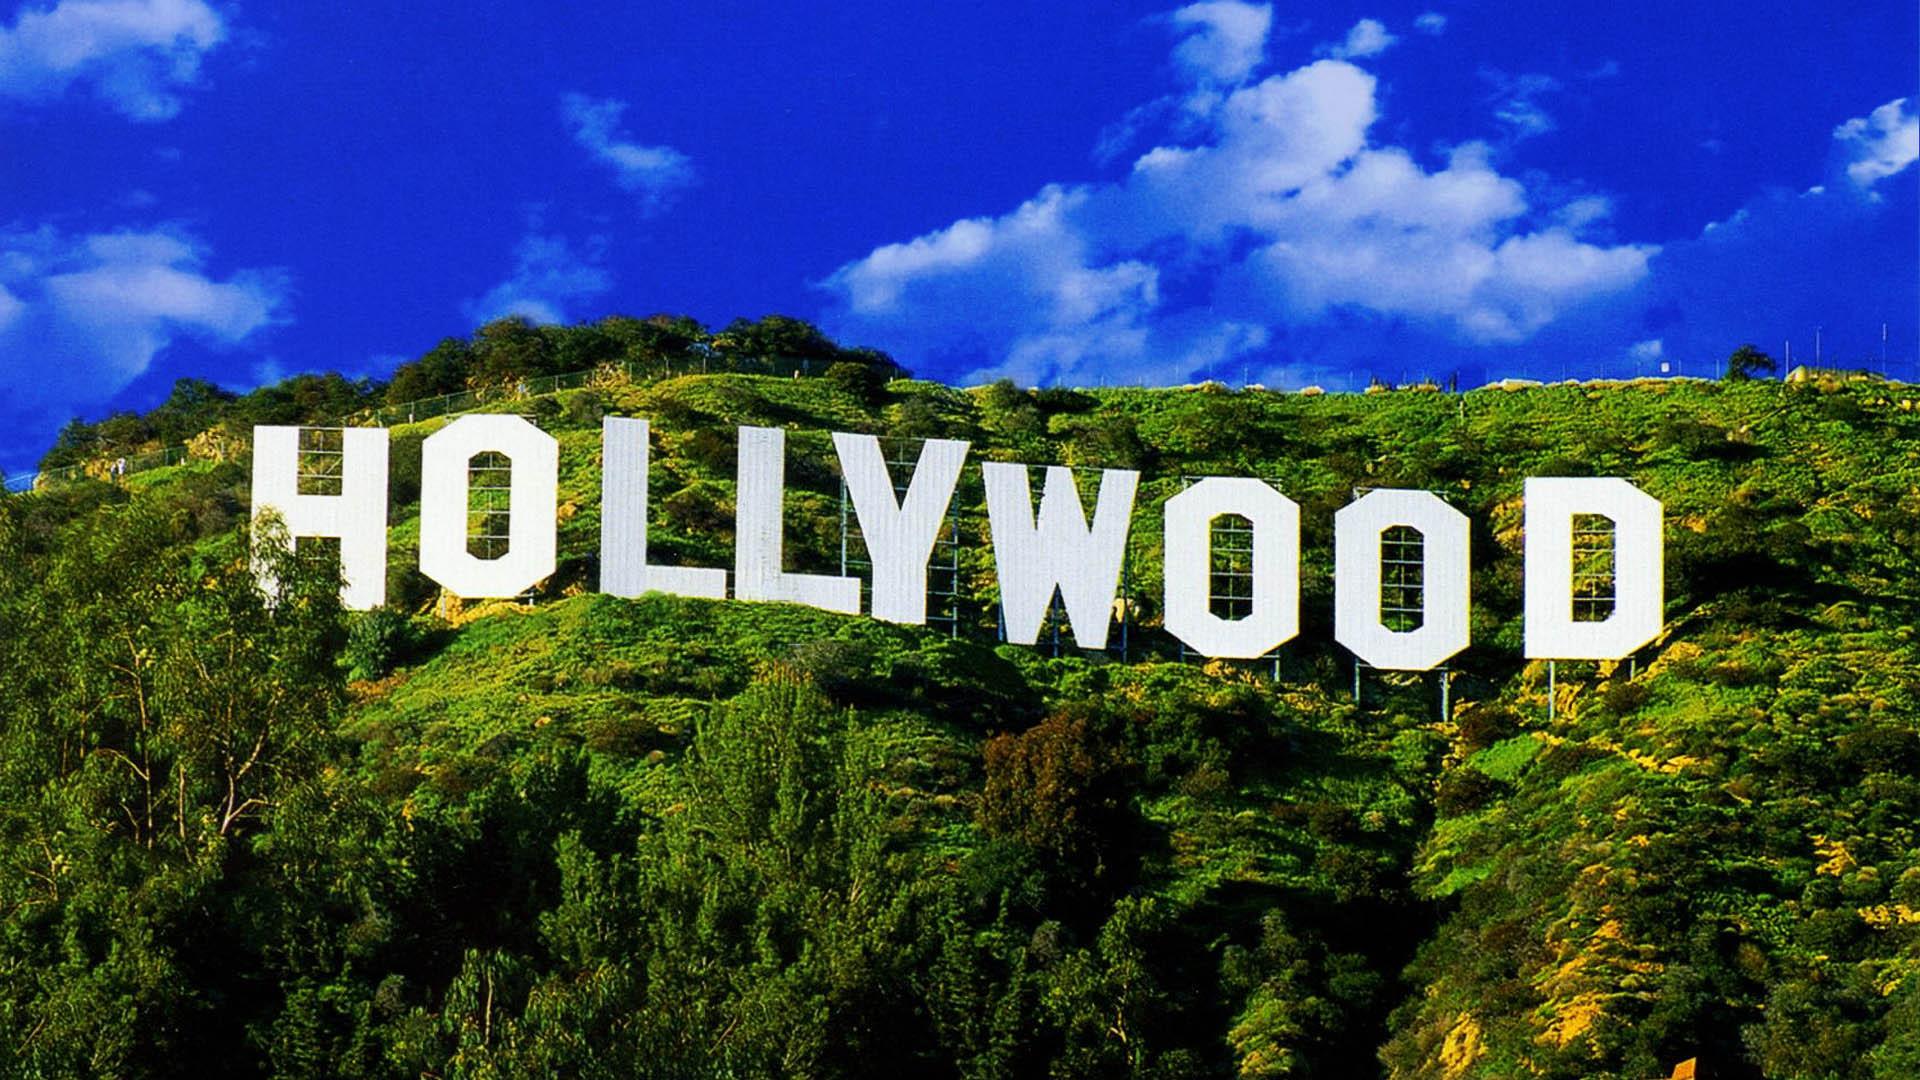 Hollywood free bdsm photo 19